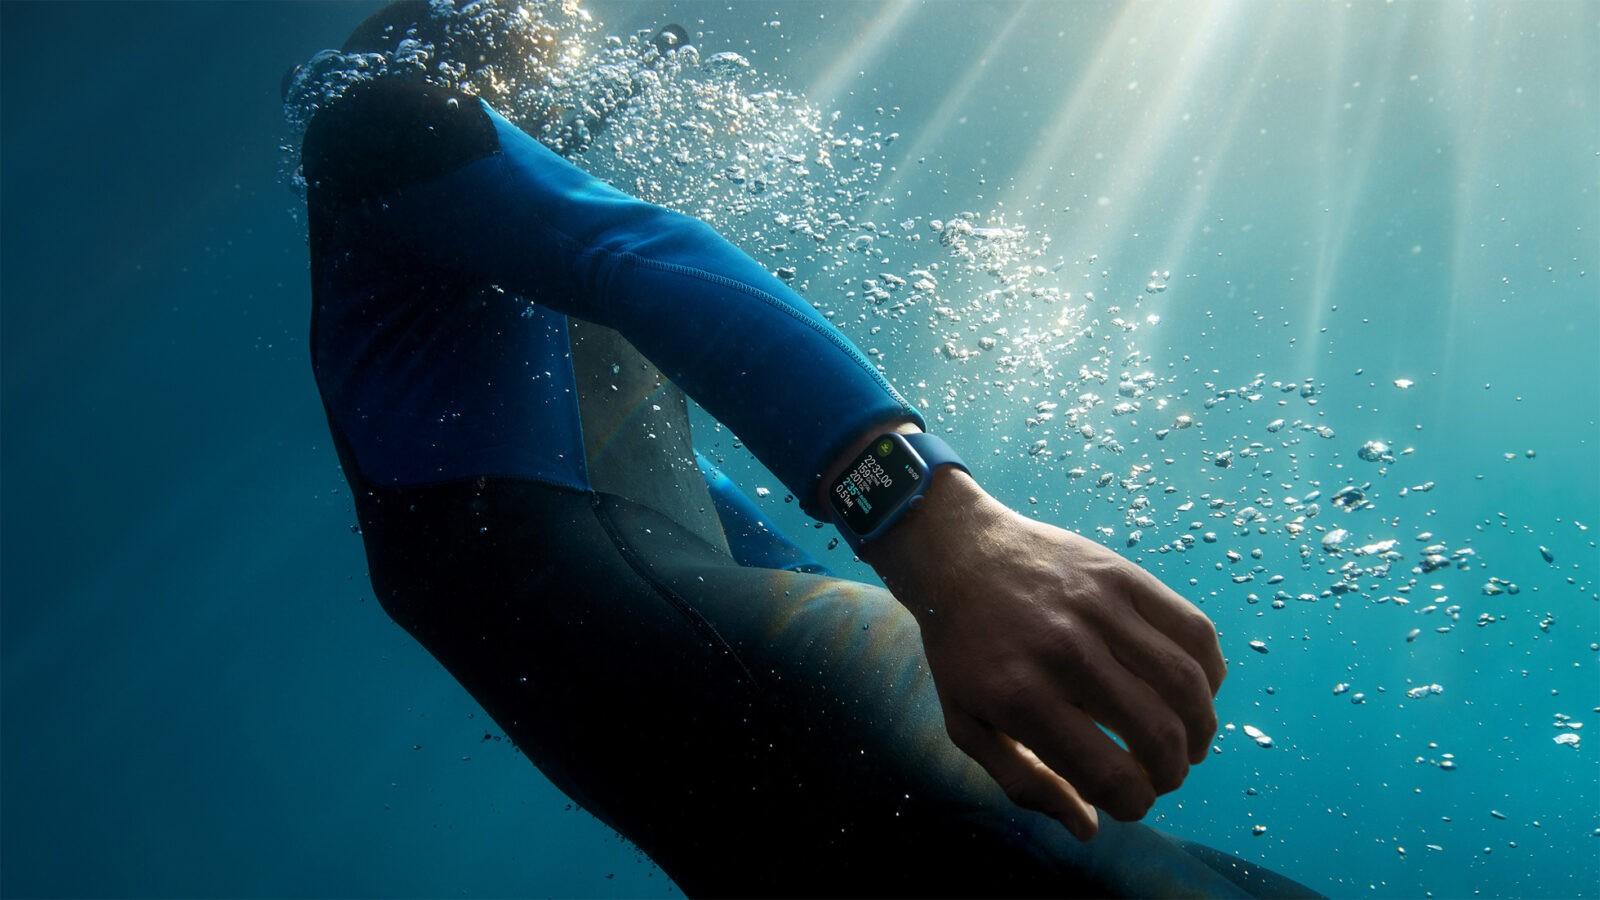 Apple выпустила Apple Watch series 7, самые прочные часы (Apple watch series7 lifestyle 02 09142021)